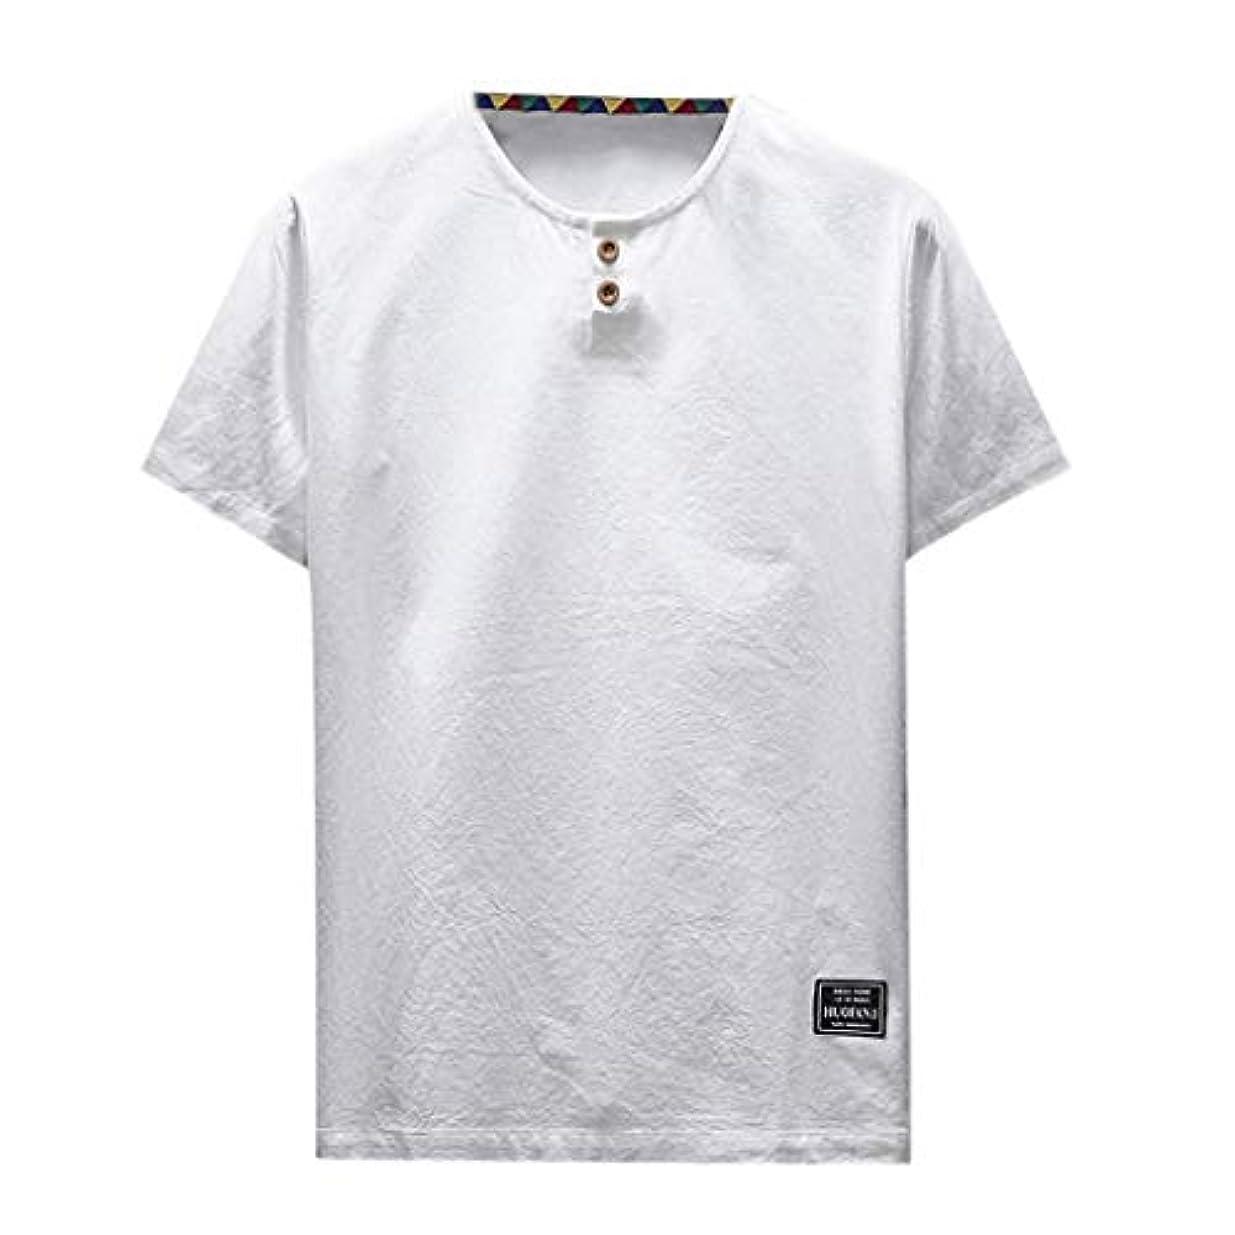 OD企画 Tシャツ メンズ 半袖 シャツ メンズ tシャツ メンズ おおきいサイズ 日系 綿麻 丸首 半袖シャツ シャツ 半袖 ブラウス トップス ゆるtシャツ 春夏節対応 おしゃれ ゆったり カットソー ファッション 夏服